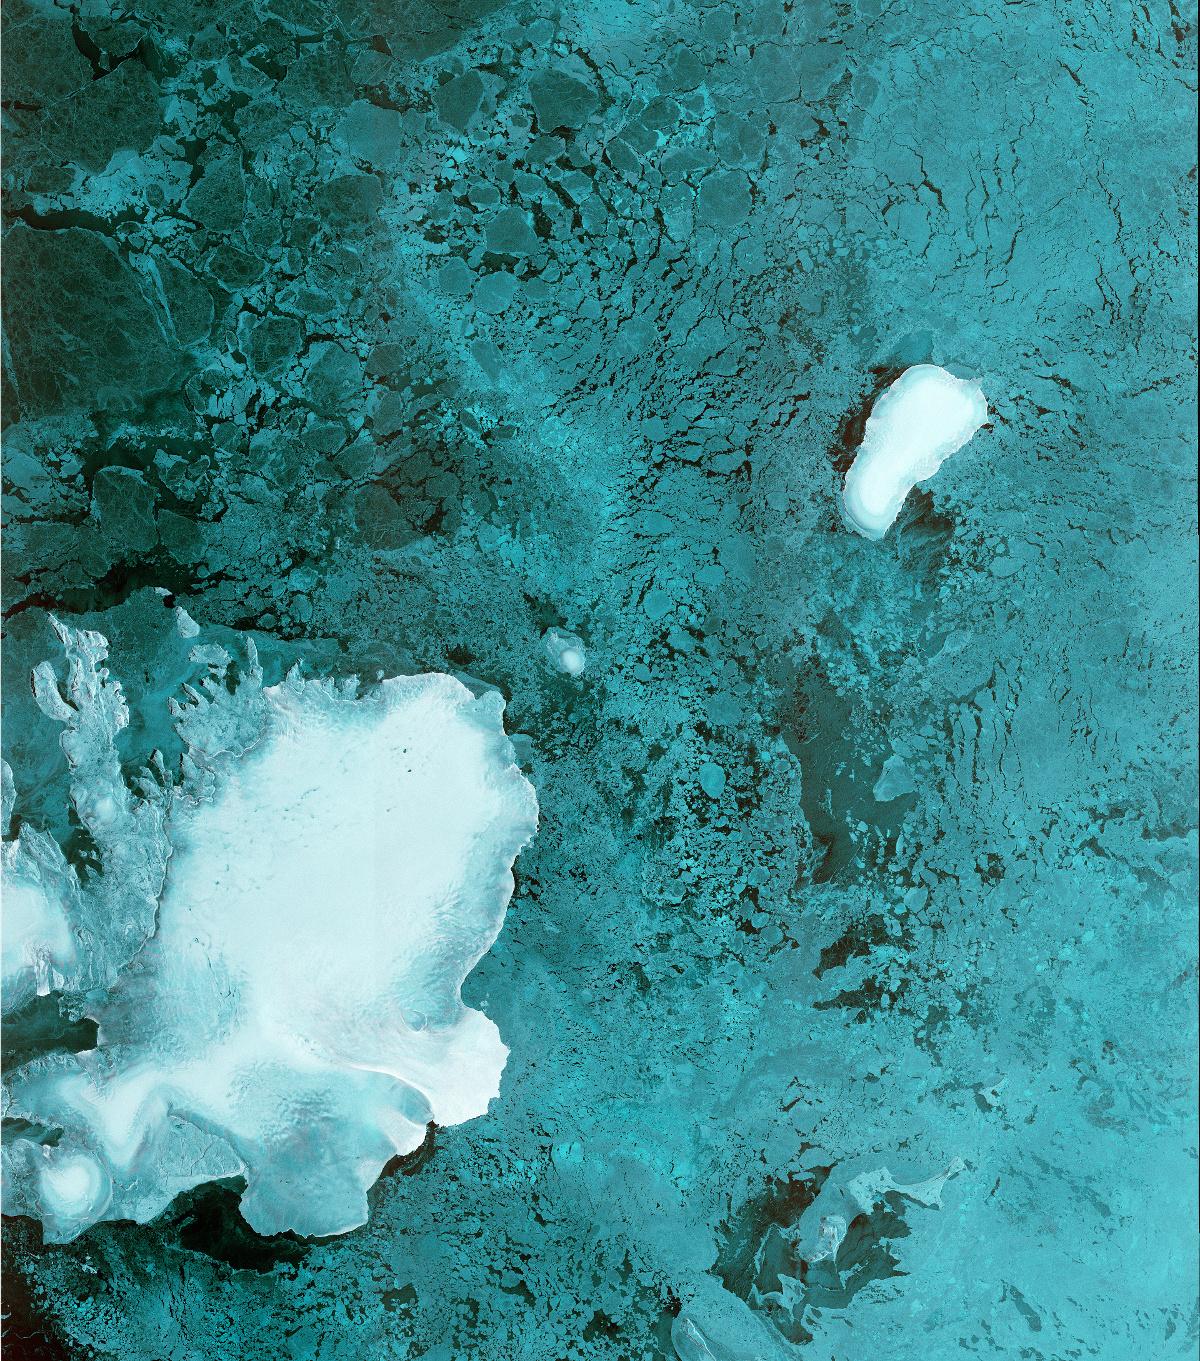 Sentinel-1B - First image - Première image - Radar - Svalbard - Norvège - Norway - ESA - Copernicus - Commission européenne